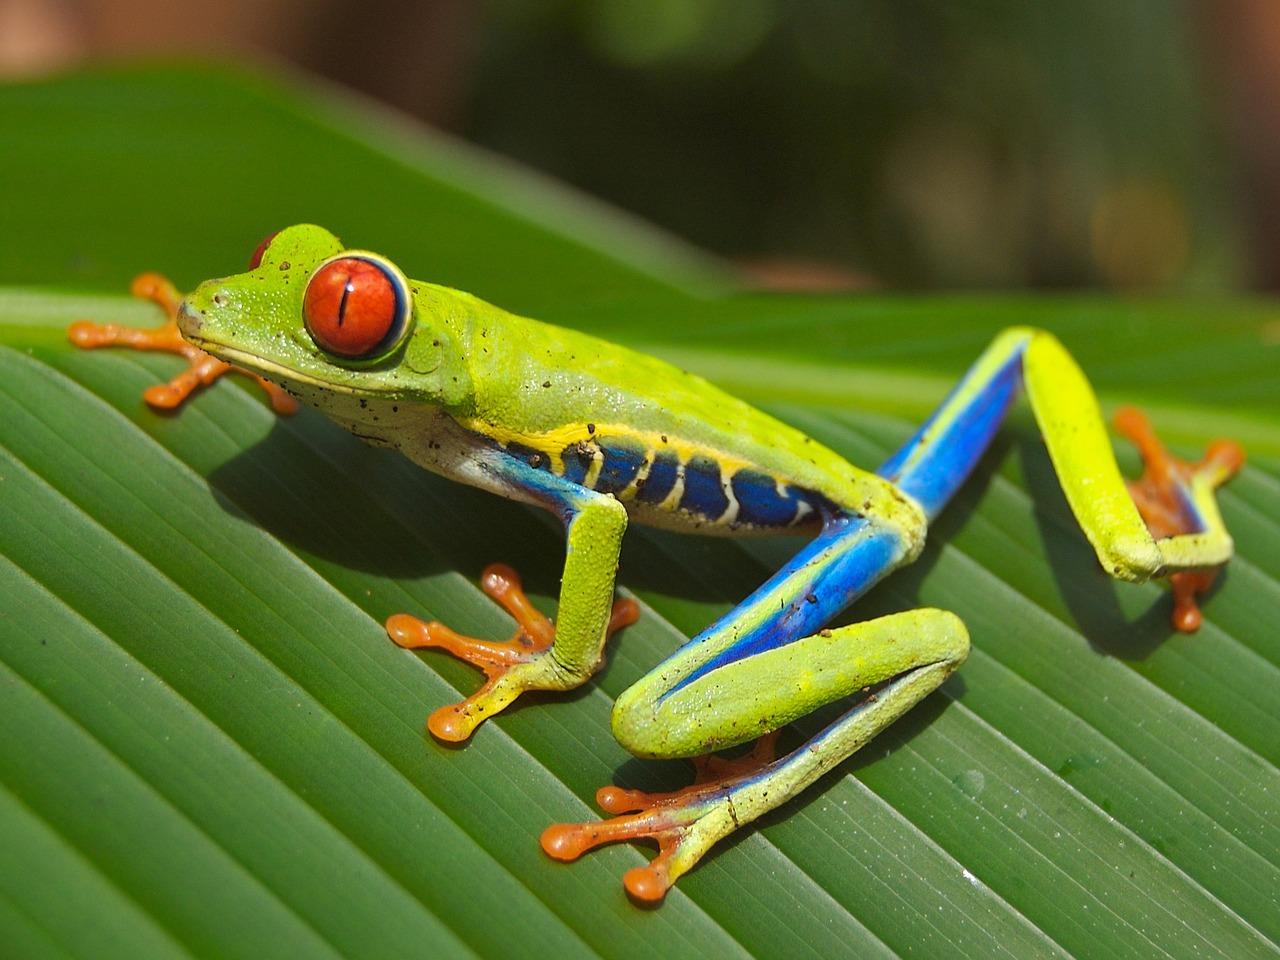 frog-643480_1280.jpg